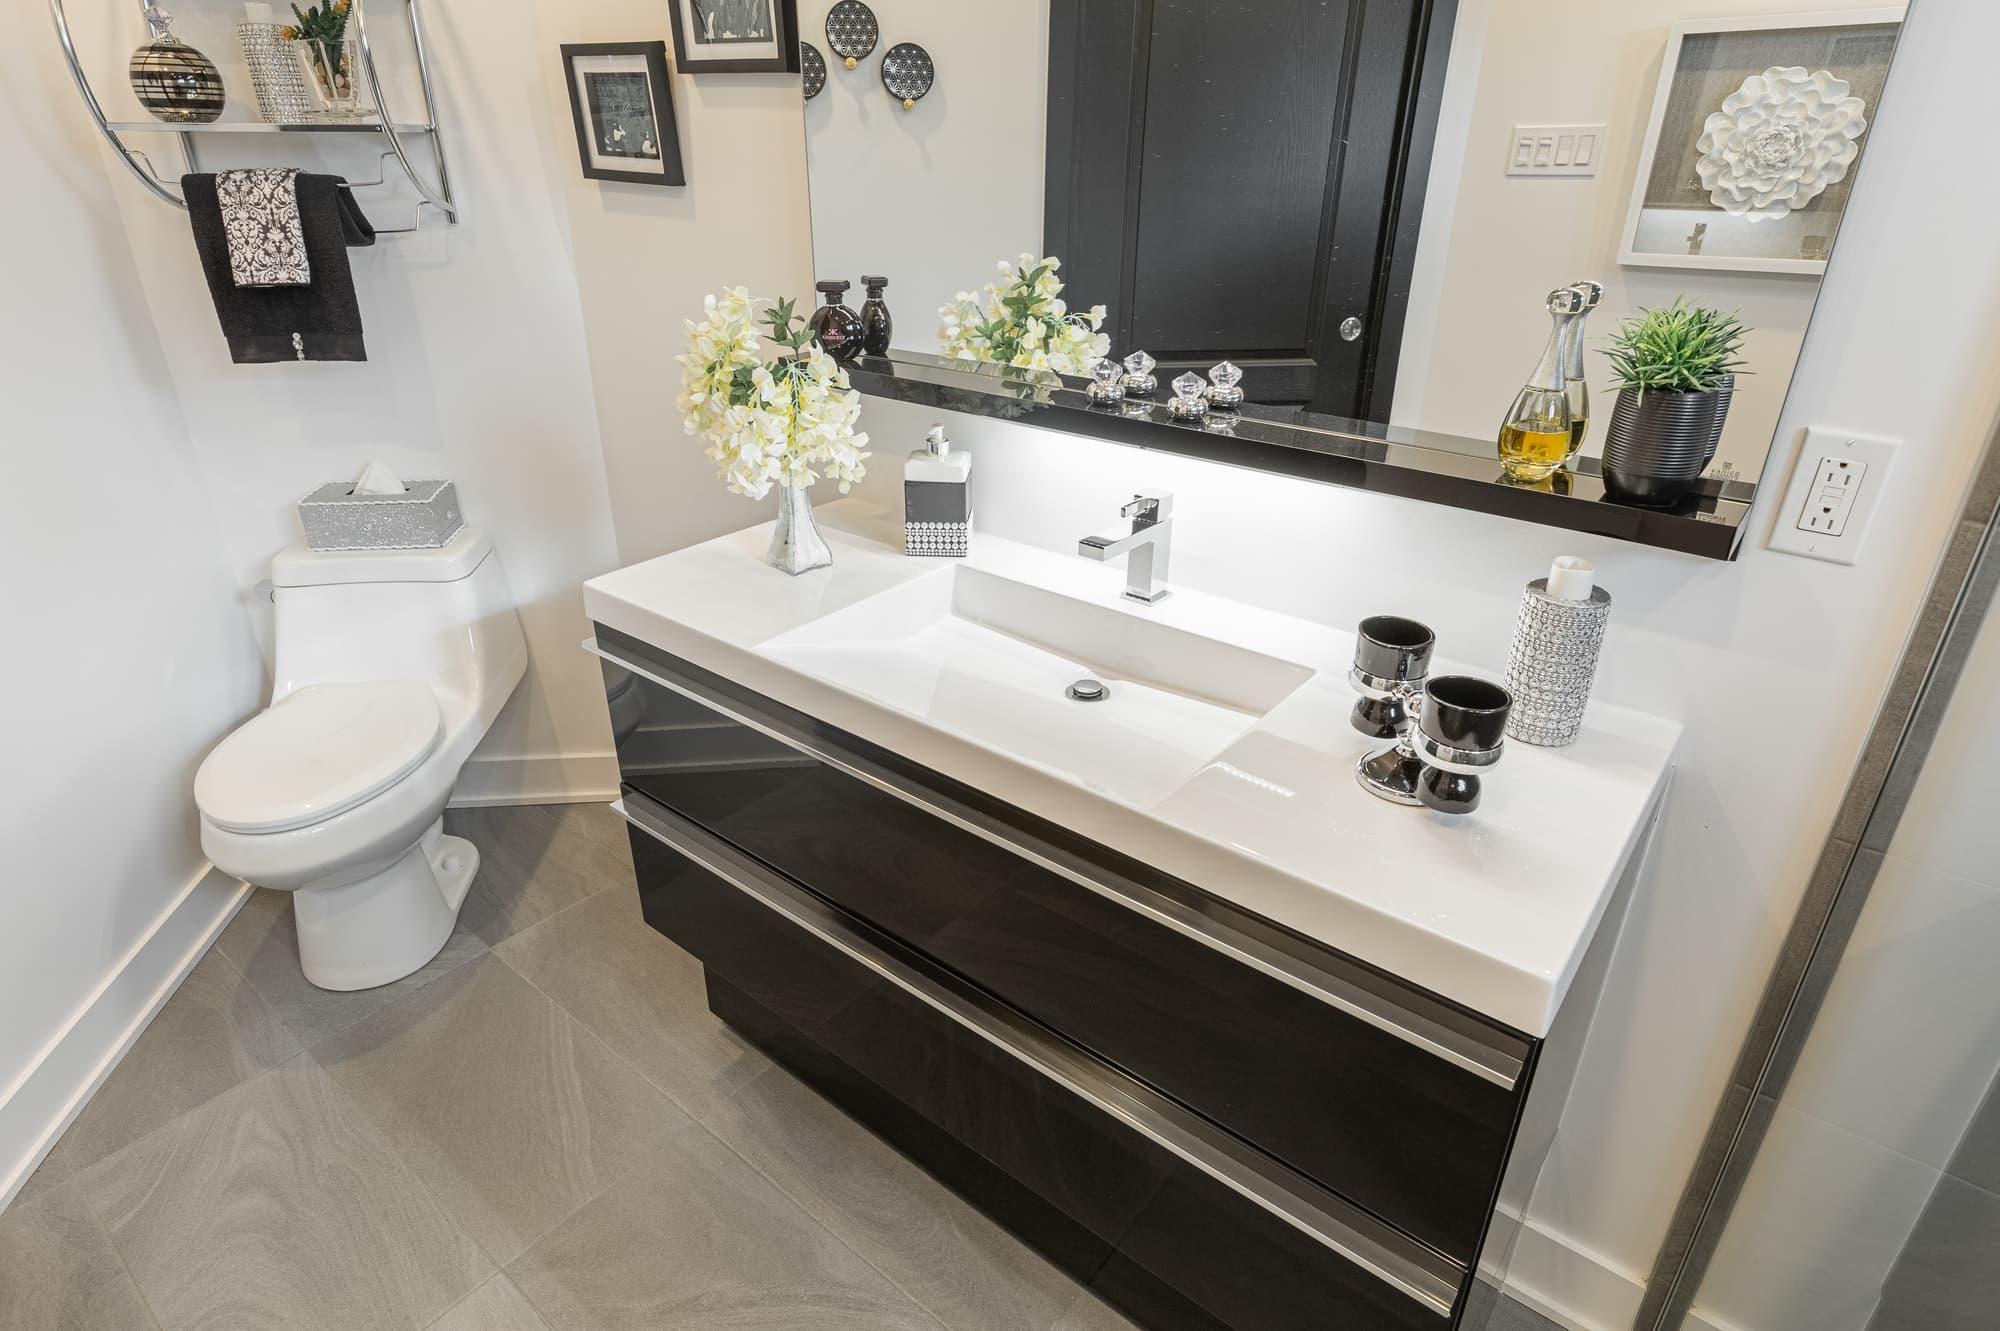 large black vanity with drawers